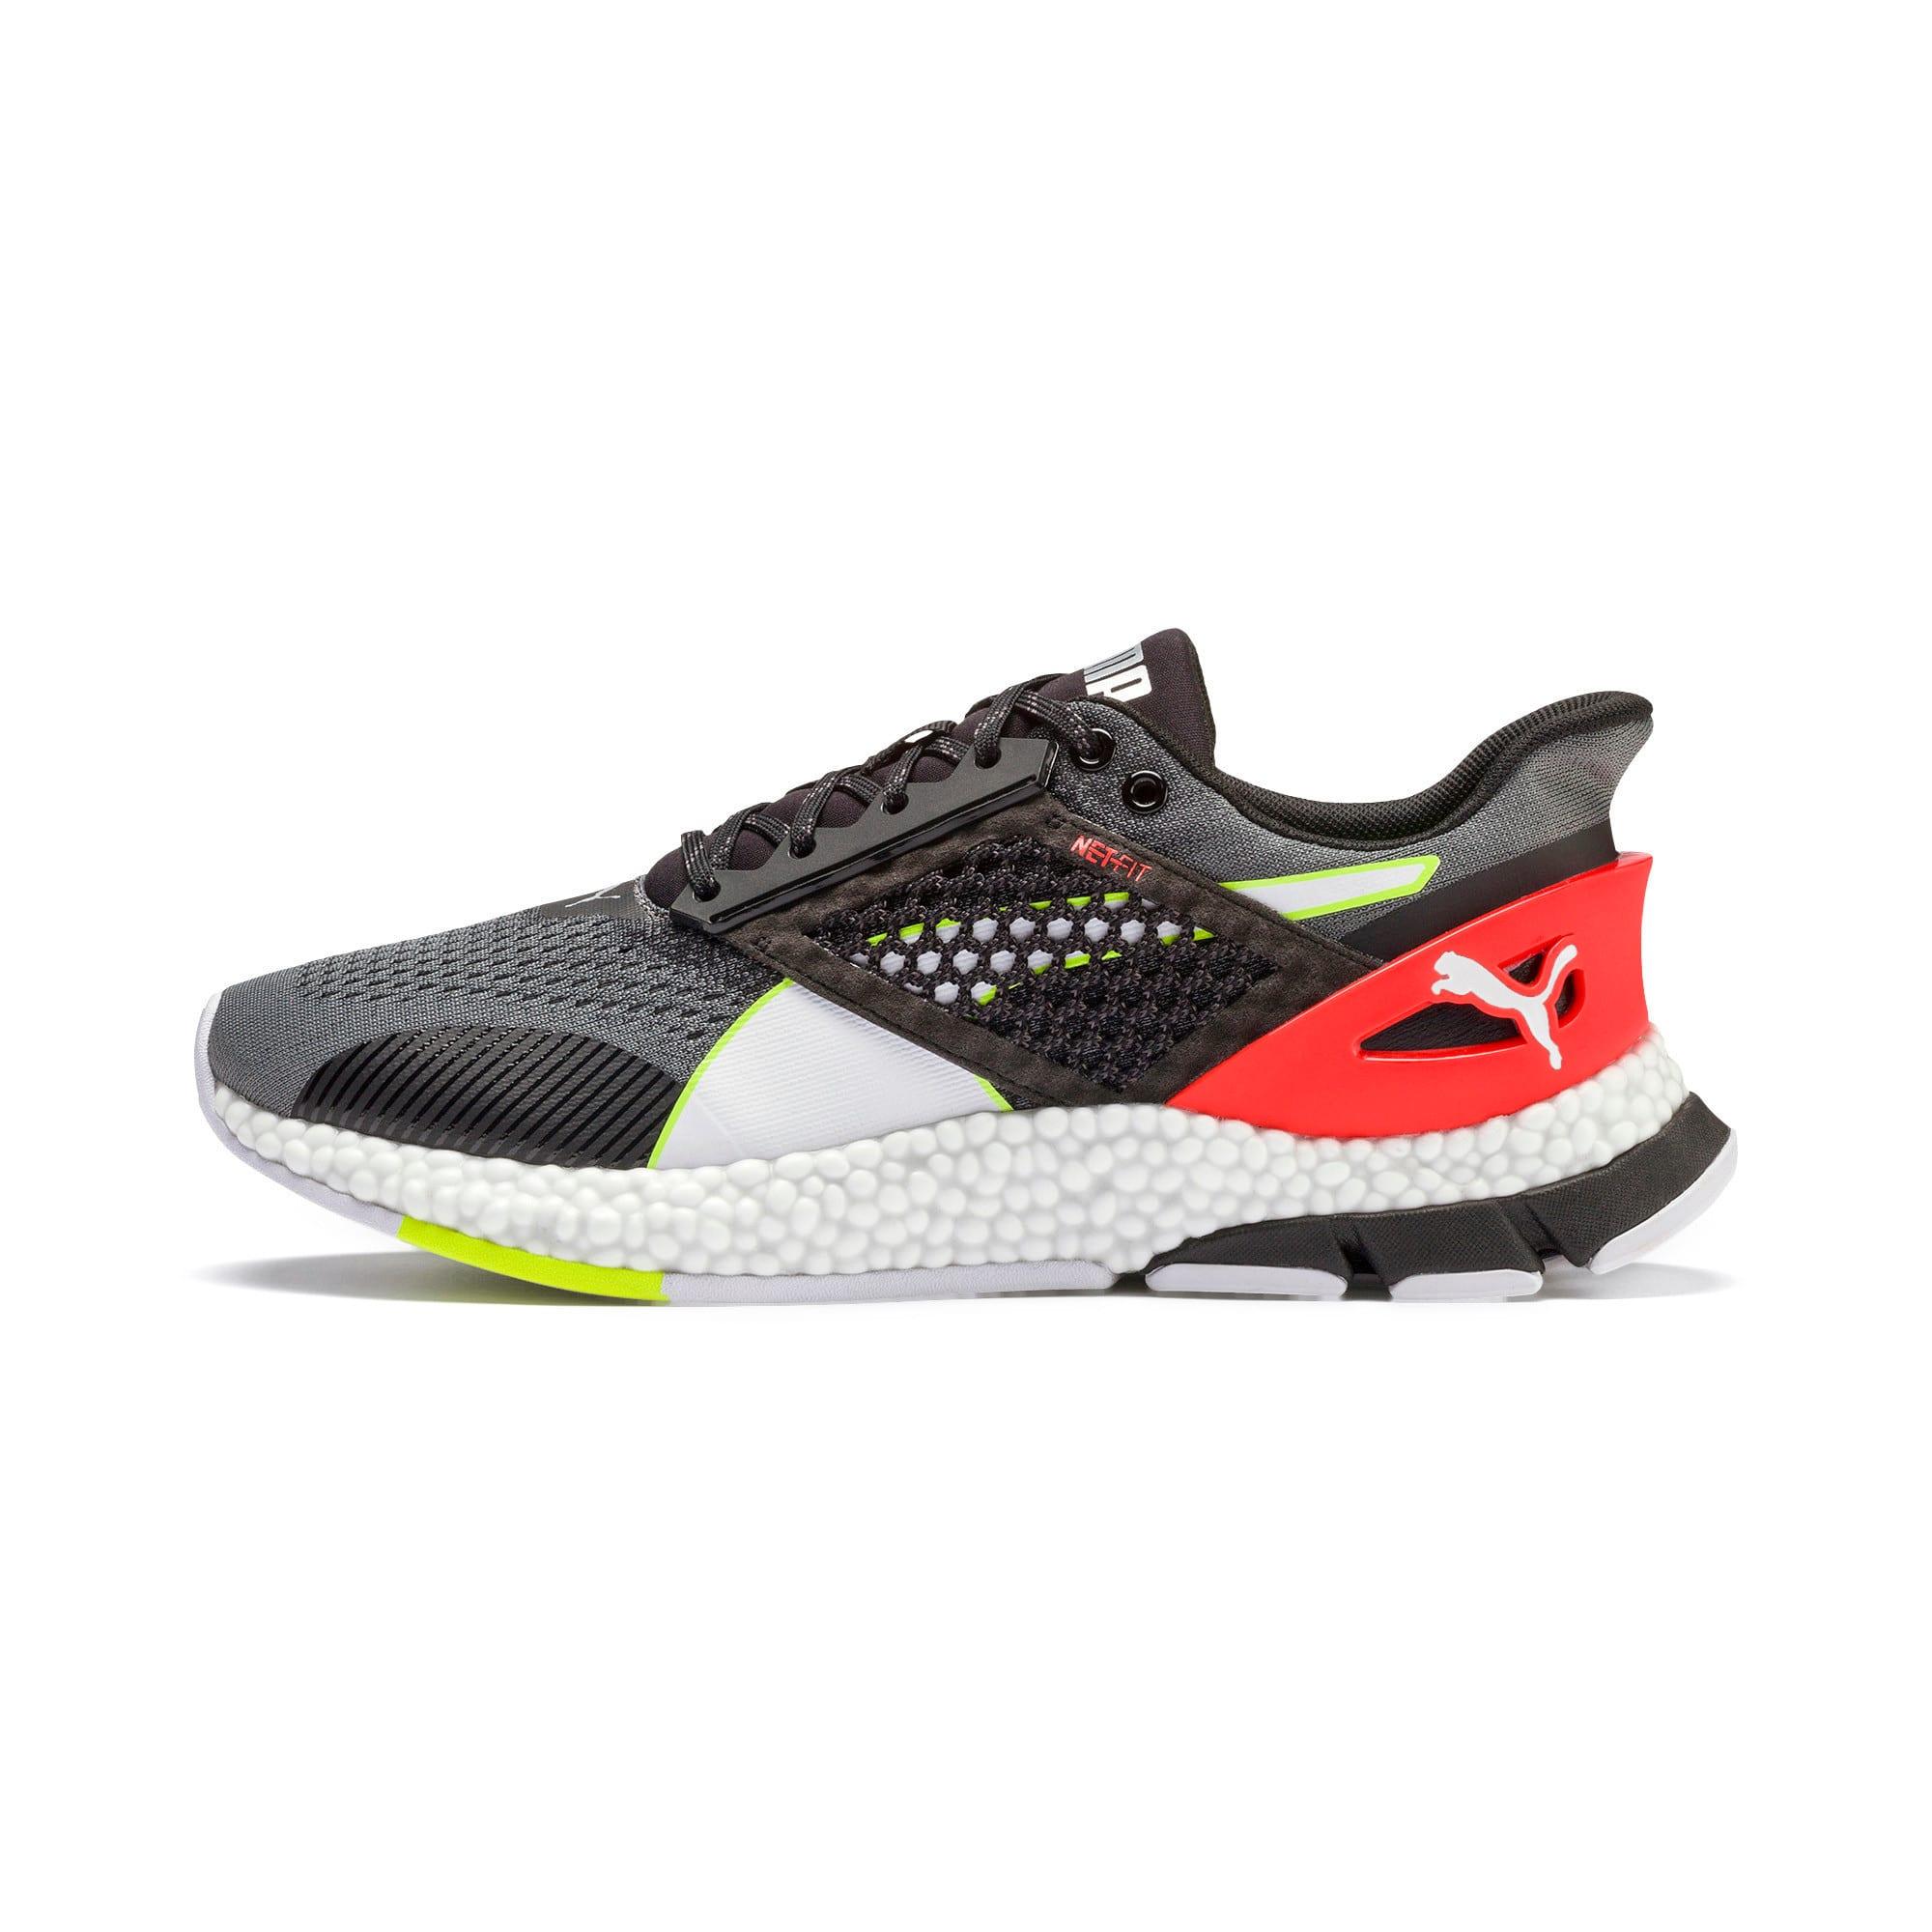 Thumbnail 1 of HYBRID NETFIT Astro Men's Running Shoes, CASTLEROCK-Puma Blck-Ngy Red, medium-IND